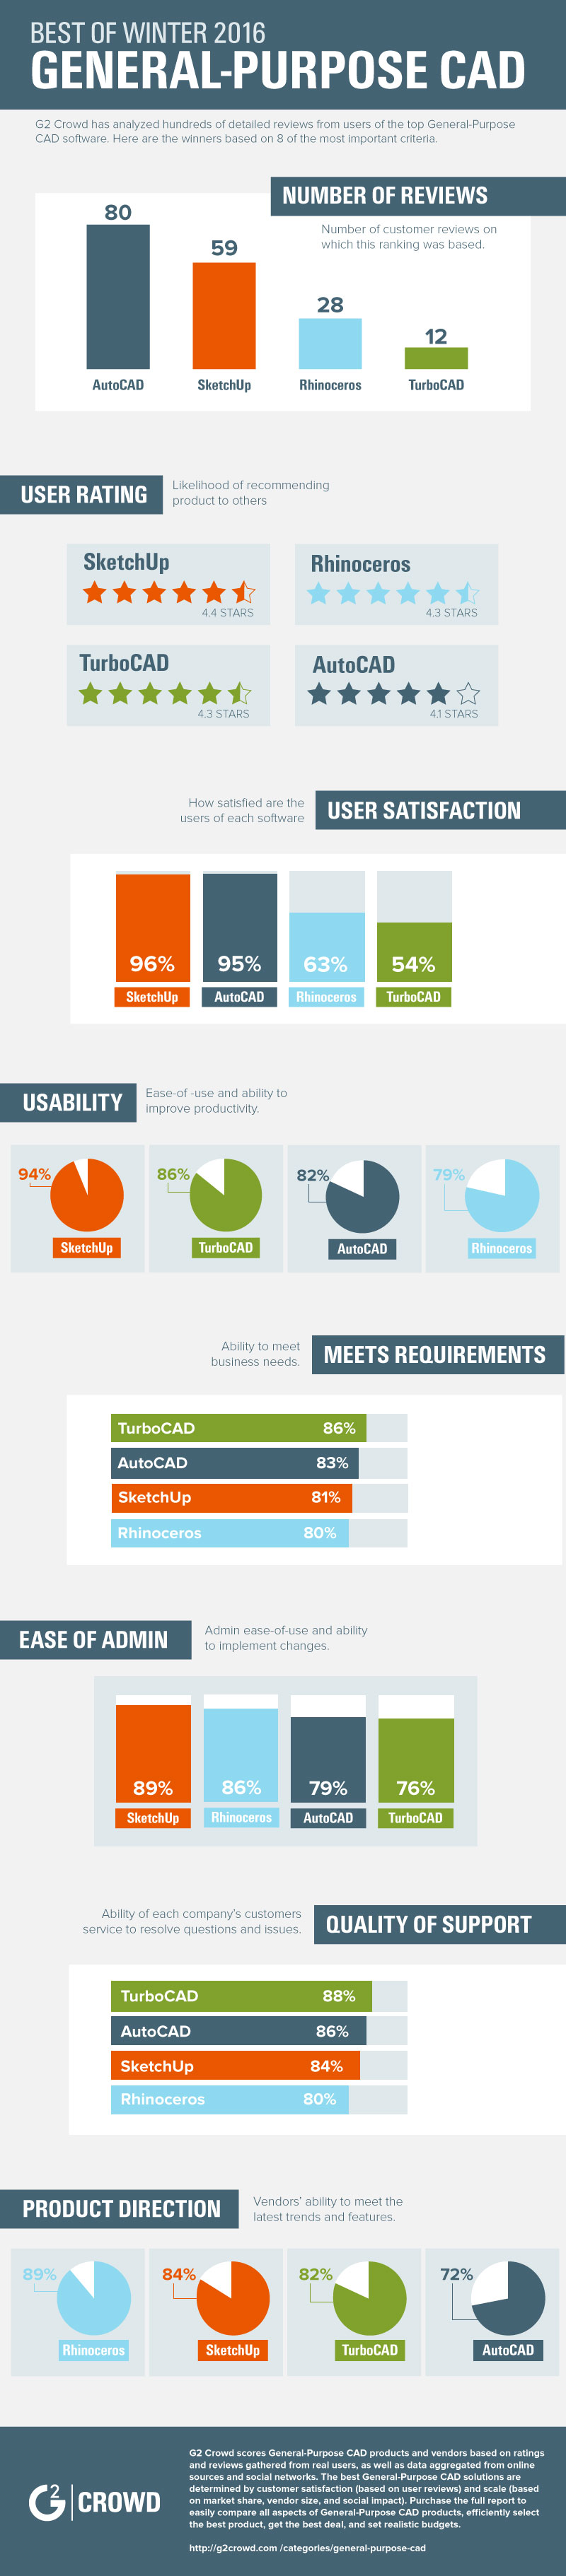 General-Purpose CAD Infographic